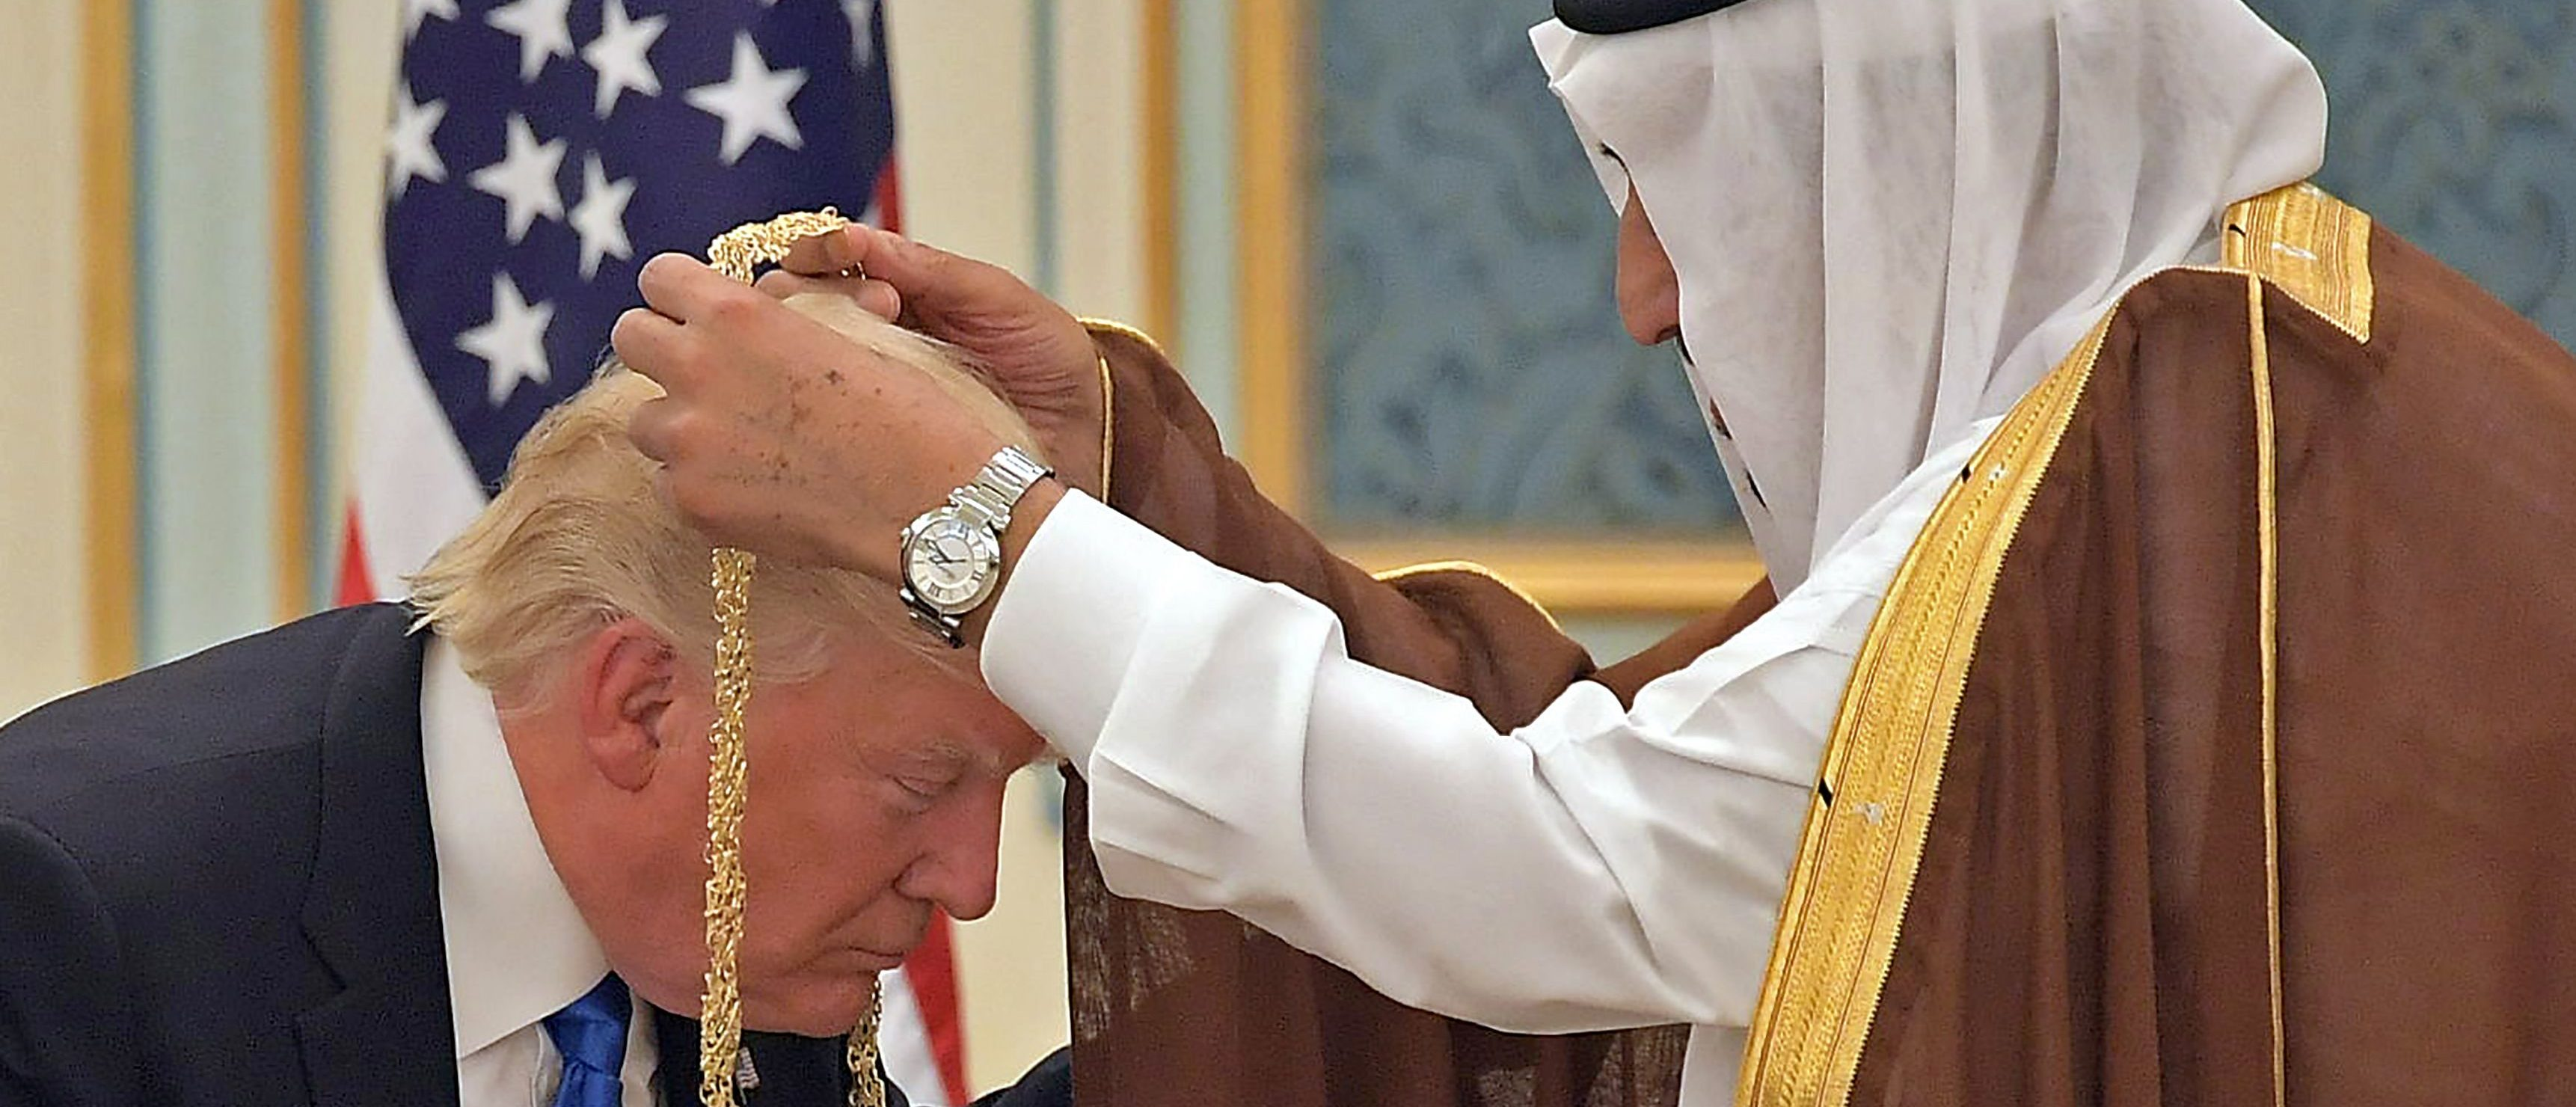 TOPSHOT - US President Donald Trump (C) receives the Order of Abdulaziz al-Saud medal from Saudi Arabia's King Salman bin Abdulaziz al-Saud (R) at the Saudi Royal Court in Riyadh on May 20, 2017. MANDEL NGAN/AFP/Getty Images